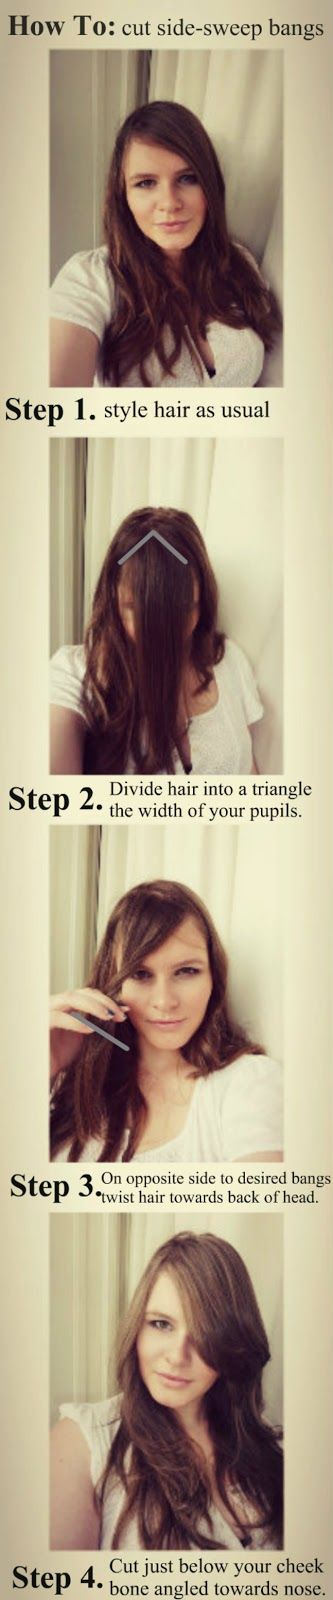 HollyWouldStudio: How To - Cut Side Sweep Bangs